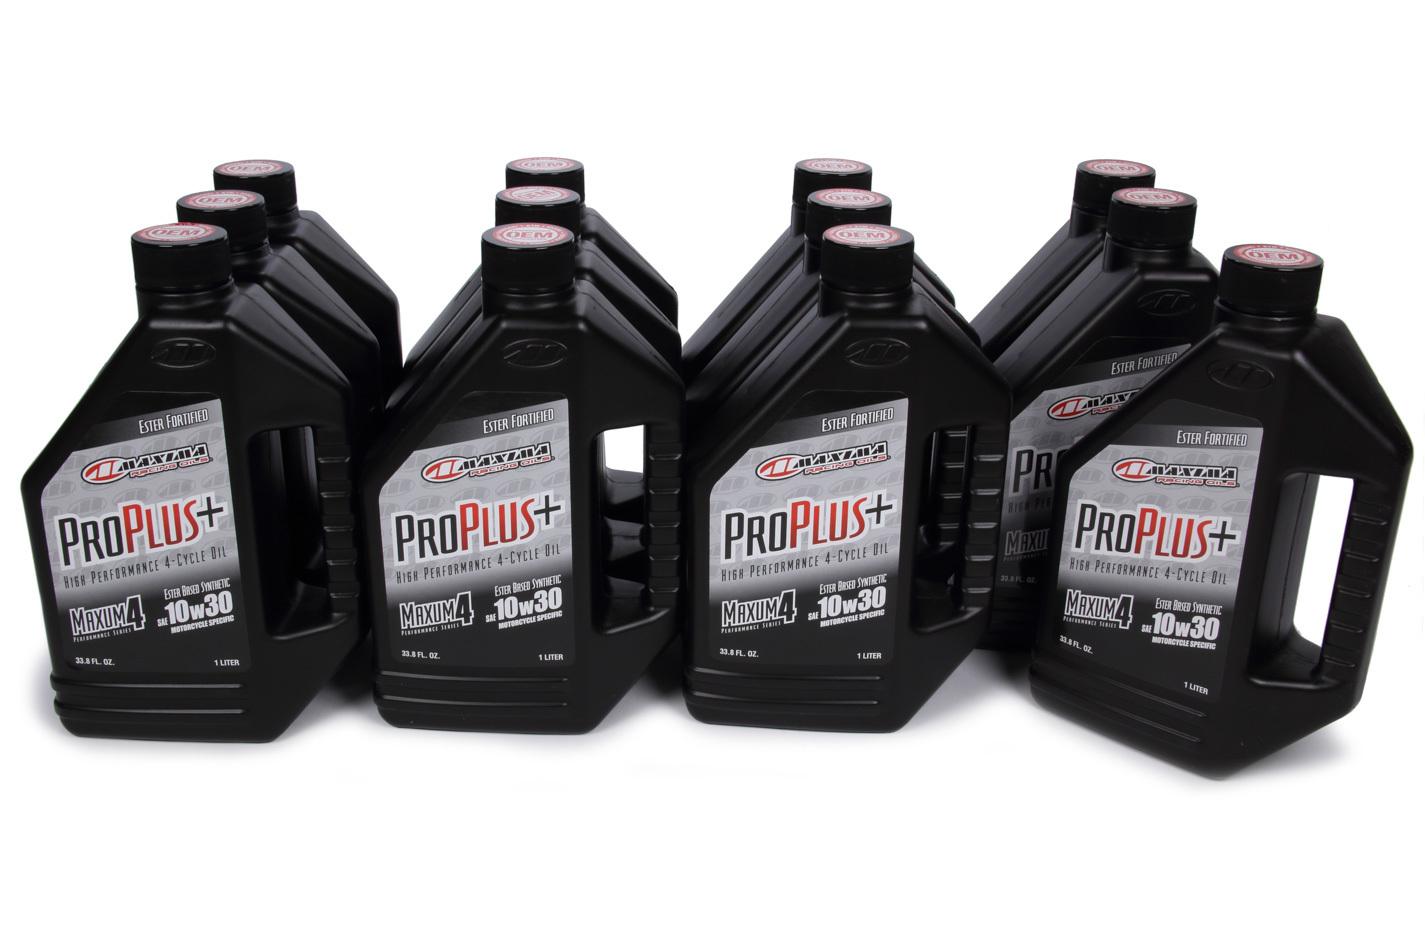 Pro Plus+ 10w30 Syntheti c Case 12 x 1 Liter